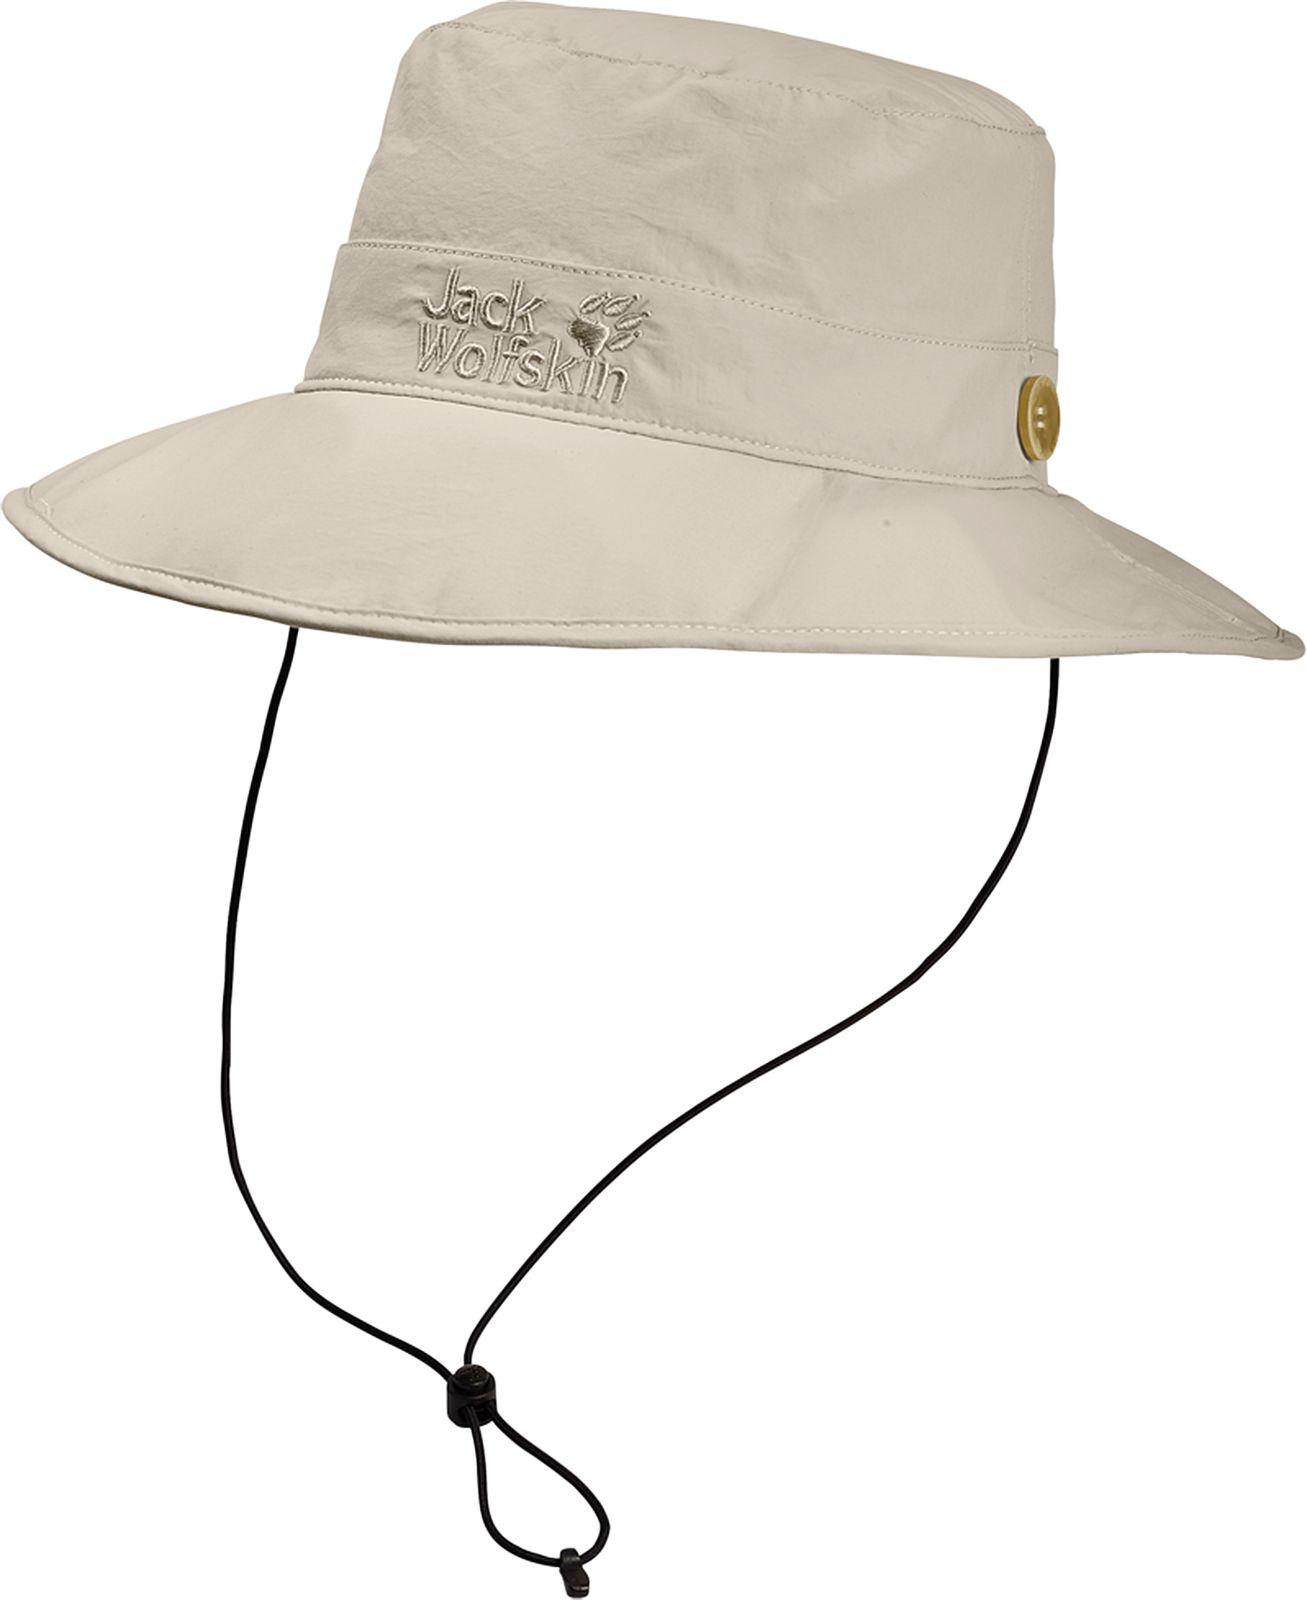 Панама Jack Wolfskin Supplex Mesh Hat, цвет: молочный. 1902042-5505. Размер M (54/57) jack wolfskin кепка supplex cap women